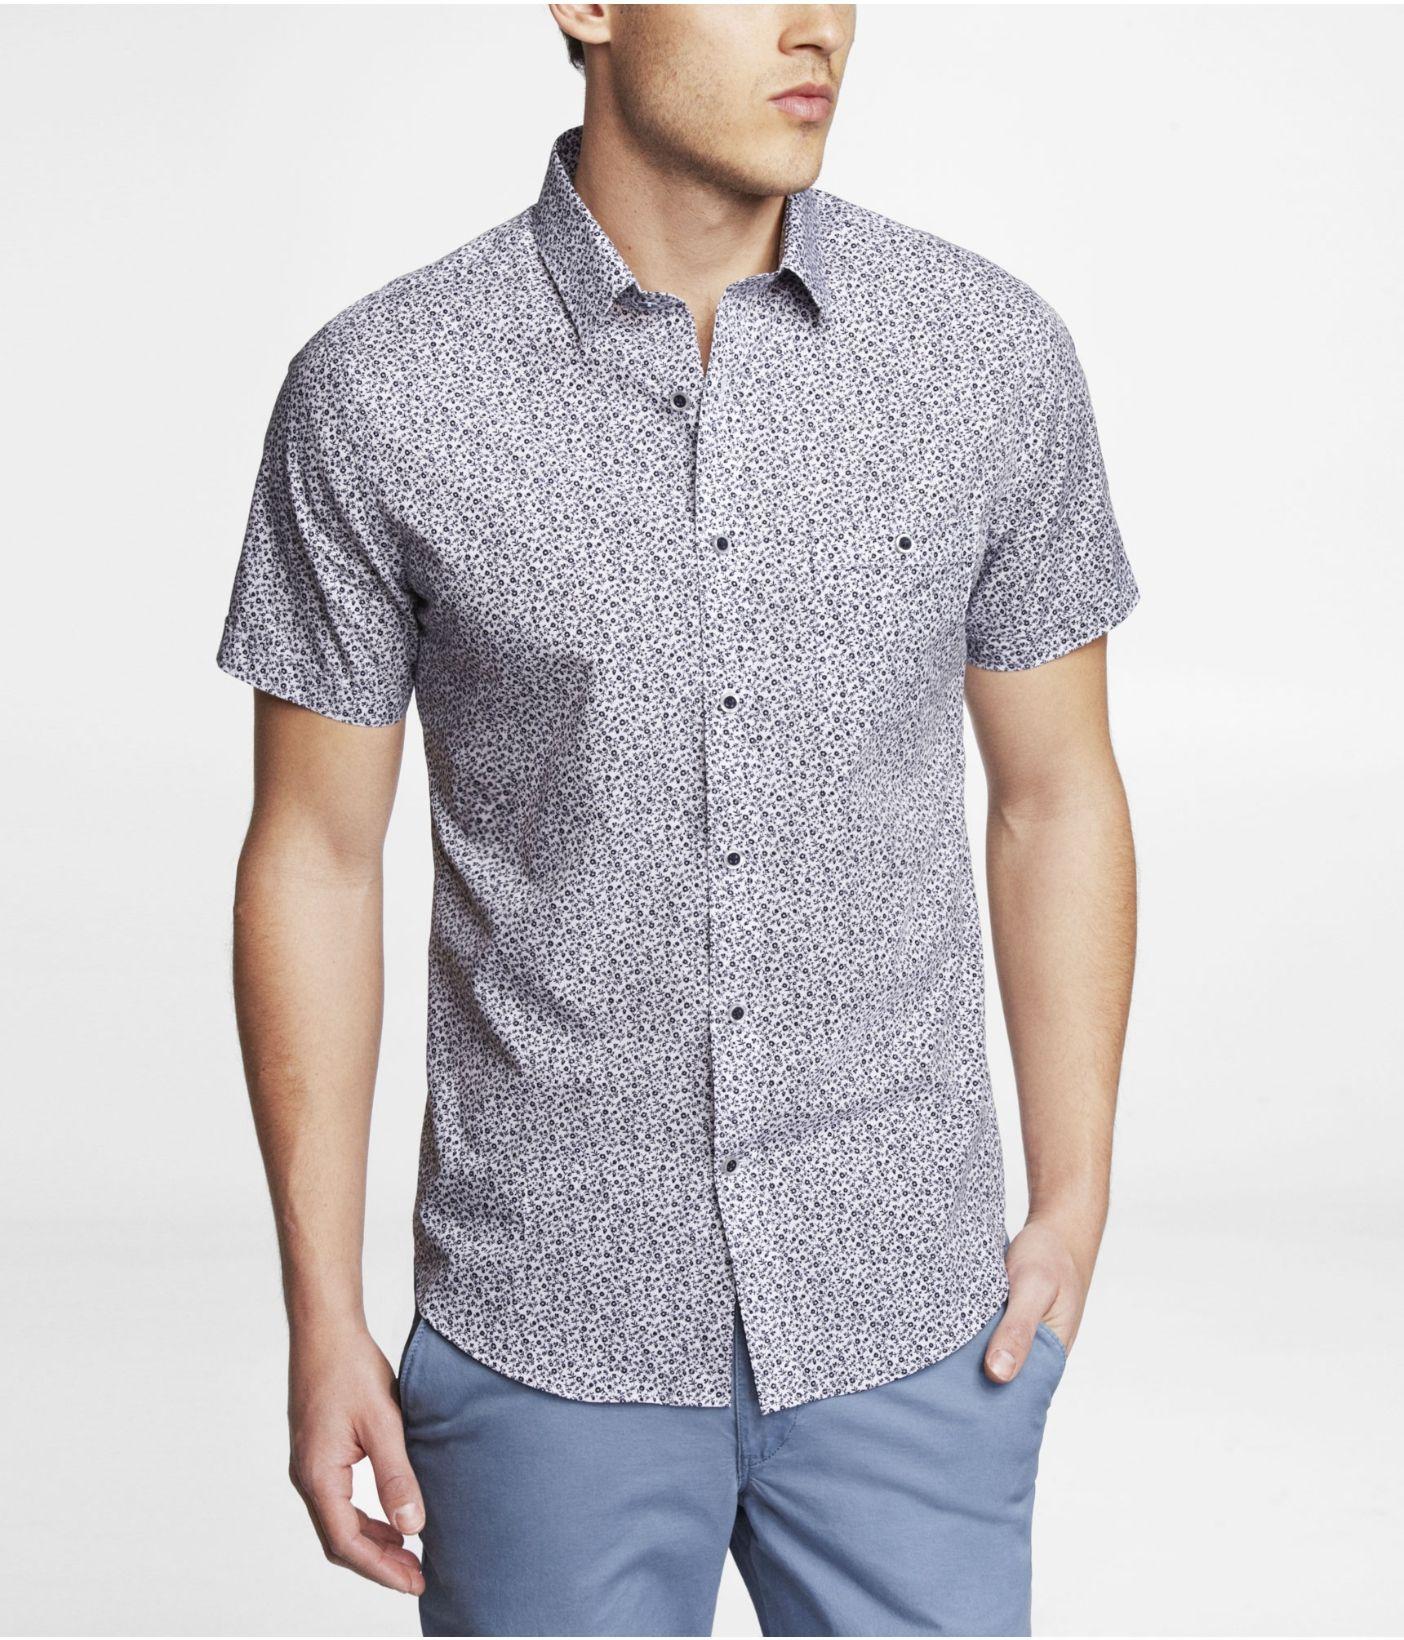 ab8c897459e2 Short Sleeve Dress Shirts Express - DREAMWORKS